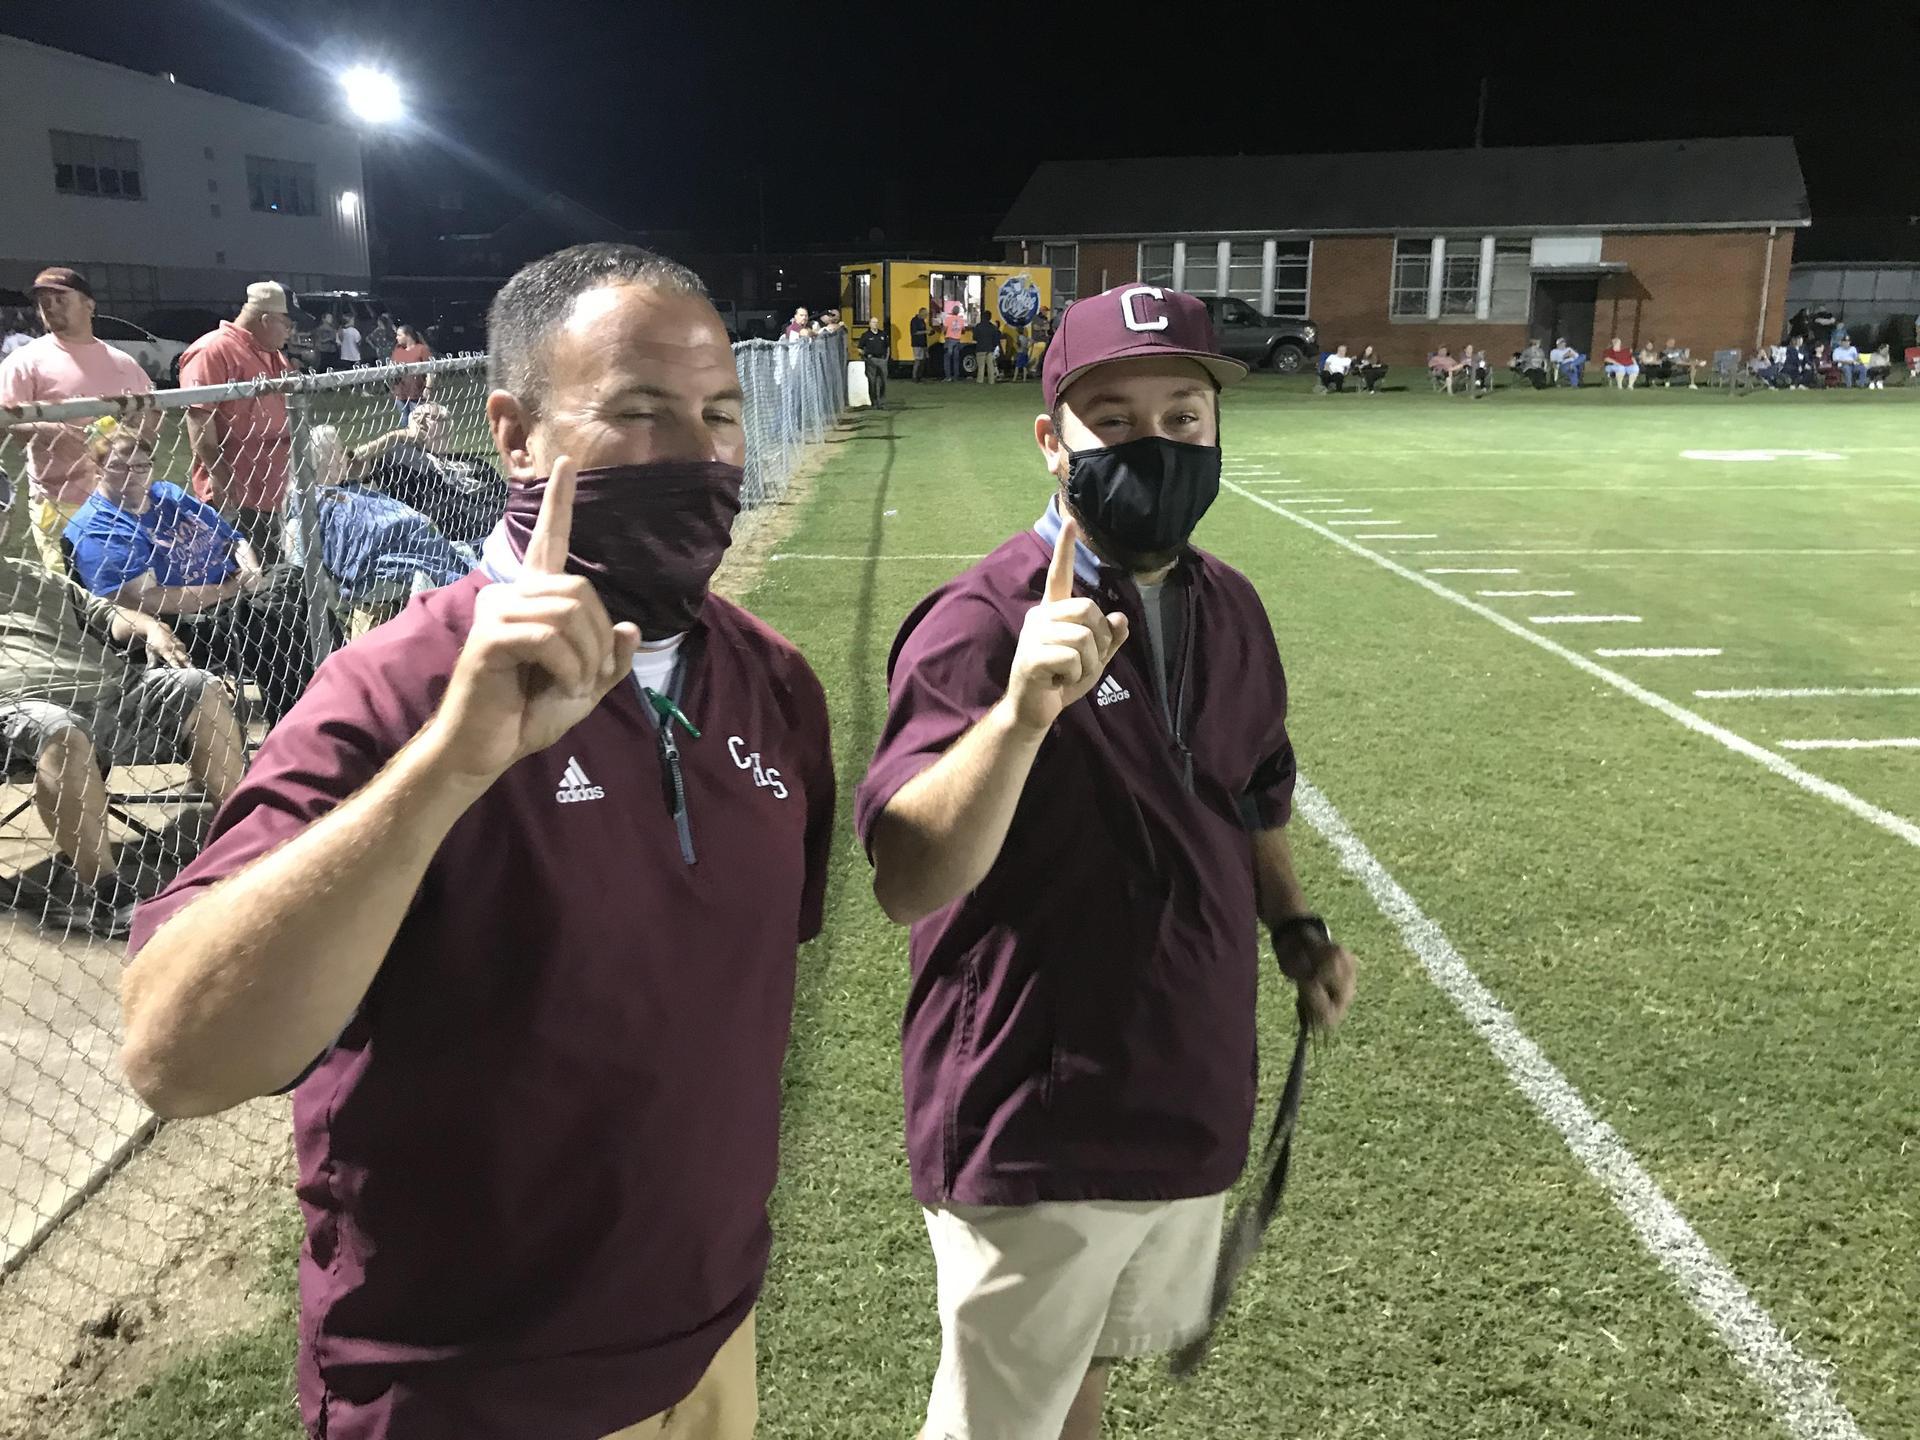 CHS Football Game Night CHS Athletic Director